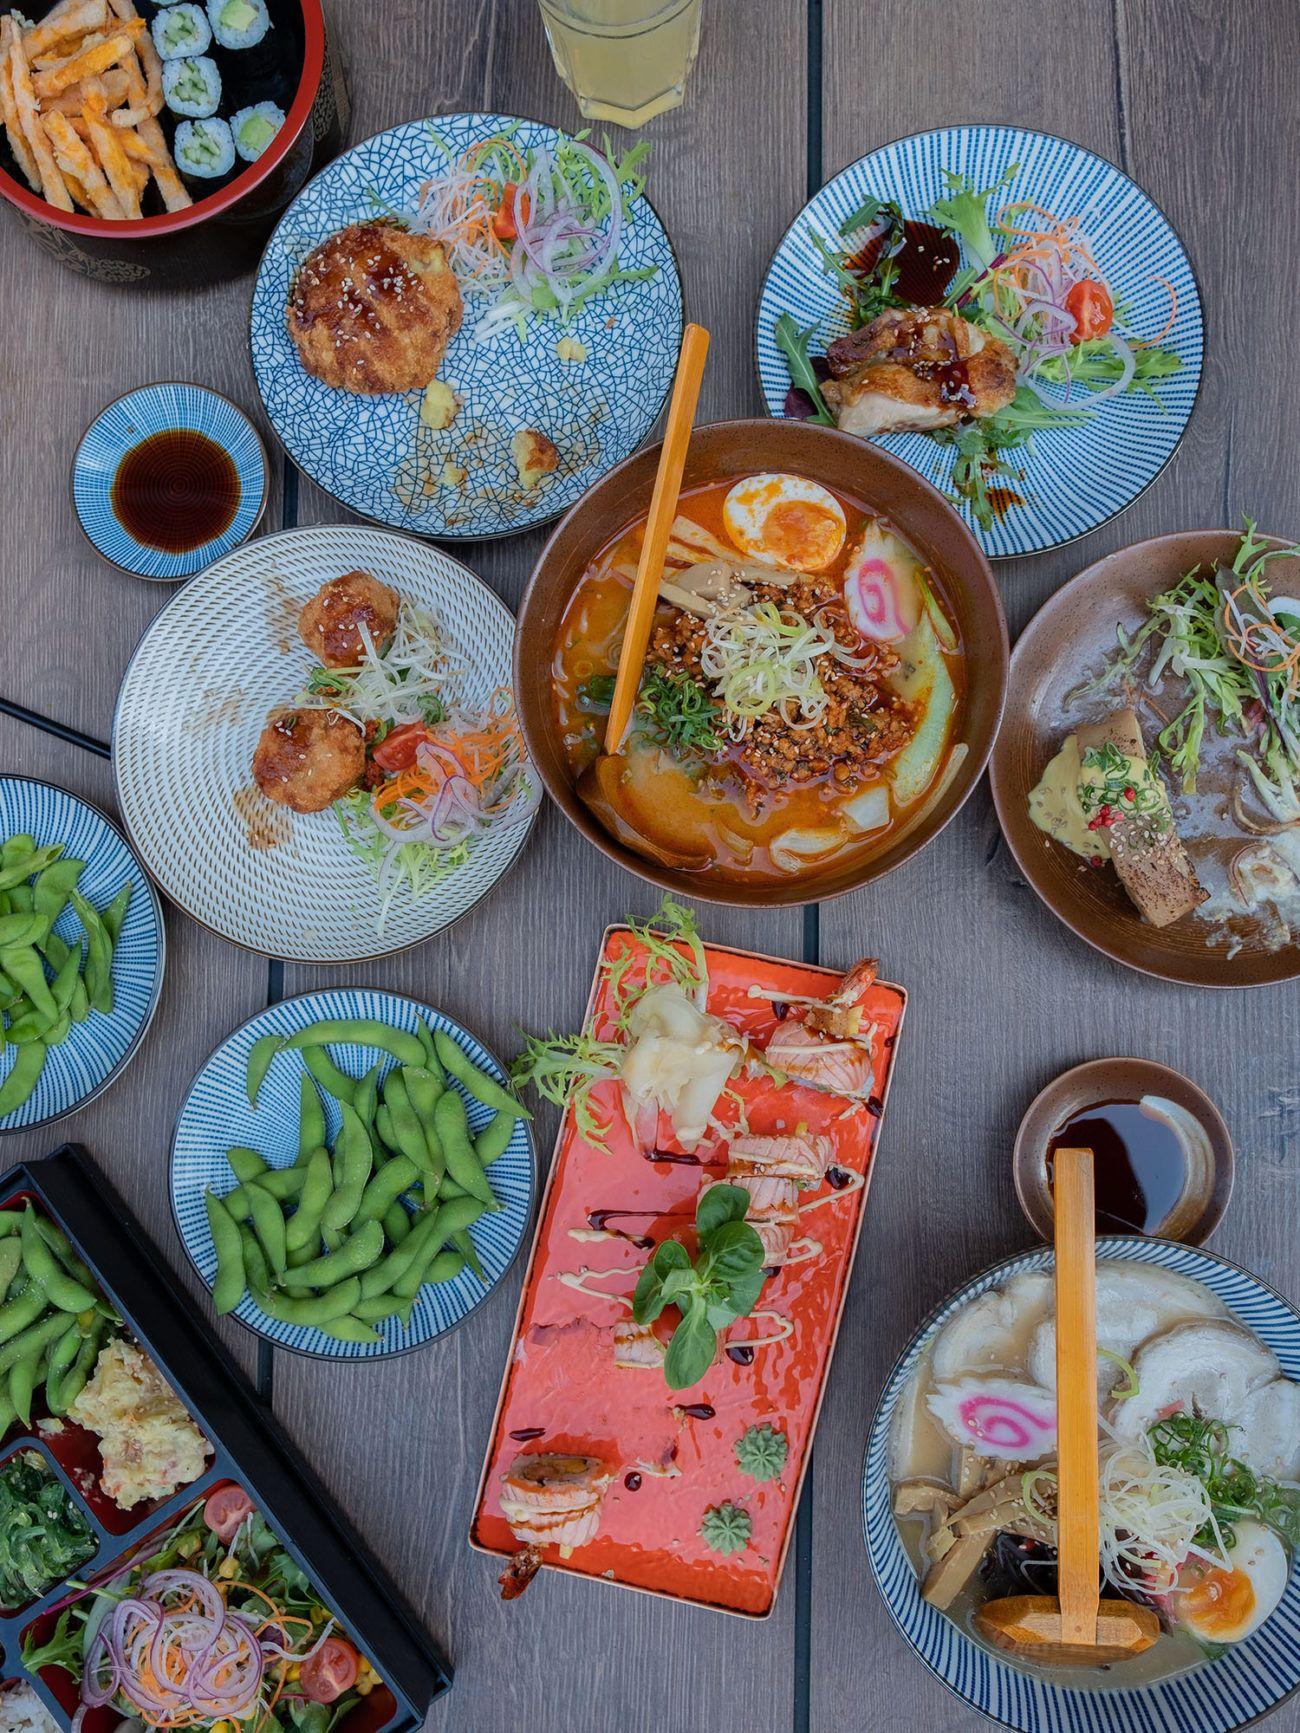 Foodblog About Fuel, Restaurant CHOTTO Berlin, Ramen, Bento Box, Izakaya